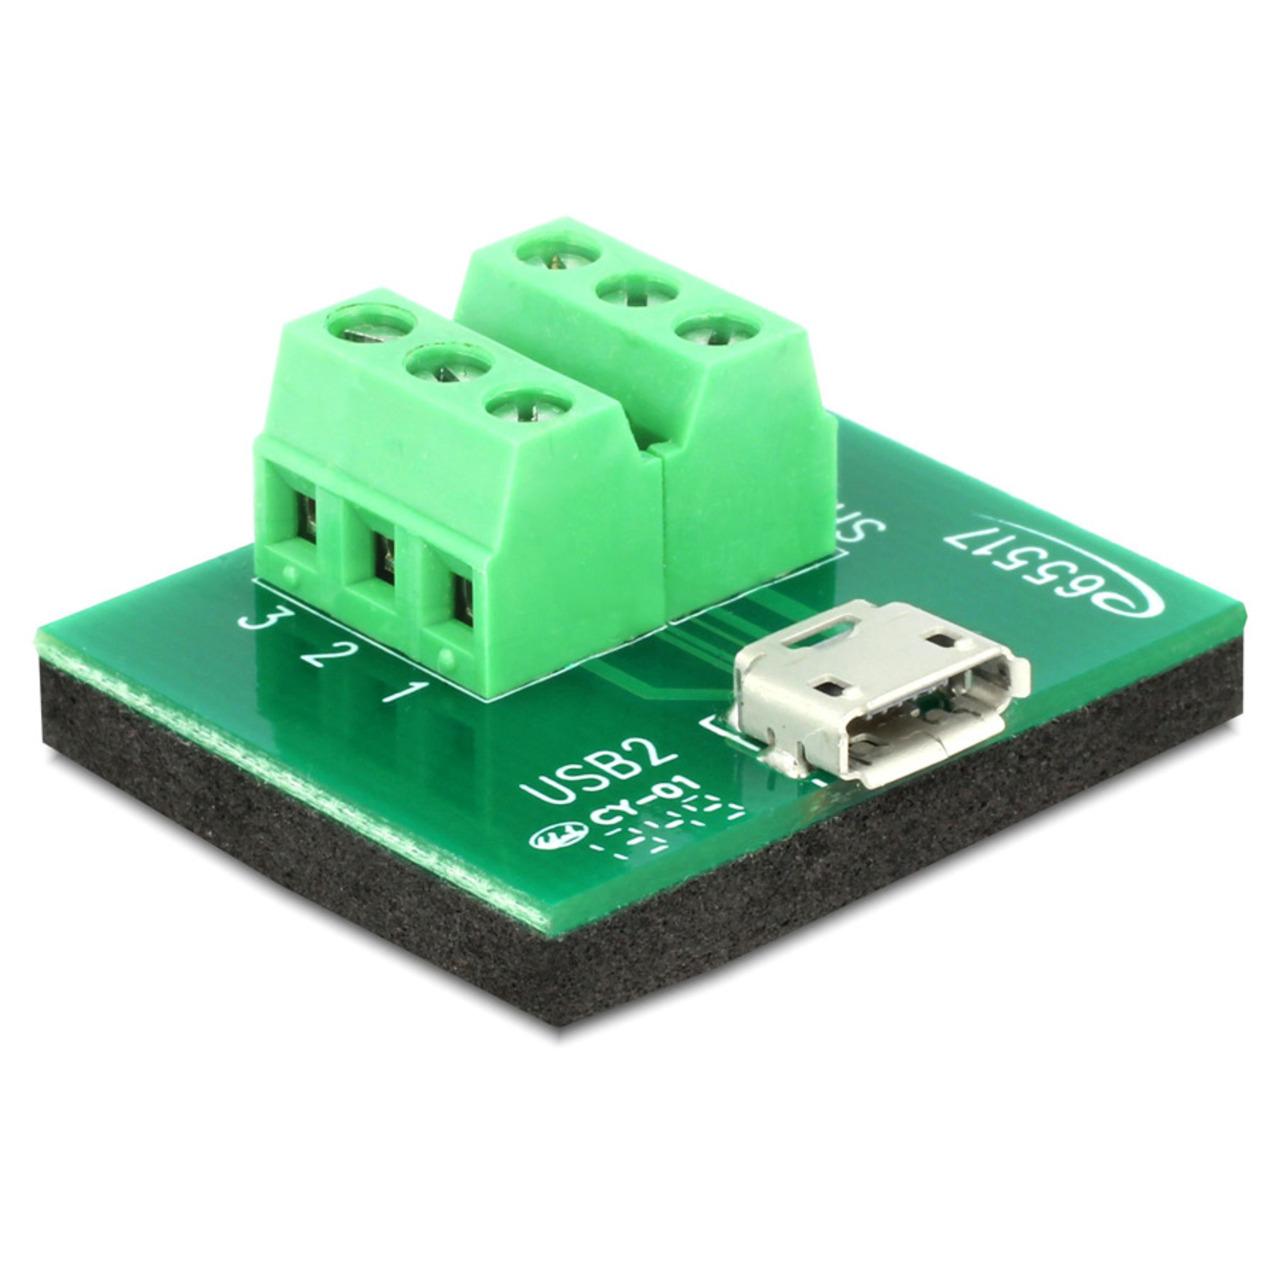 Delock Adapter Terminalblock - Micro USB Typ B Buchse